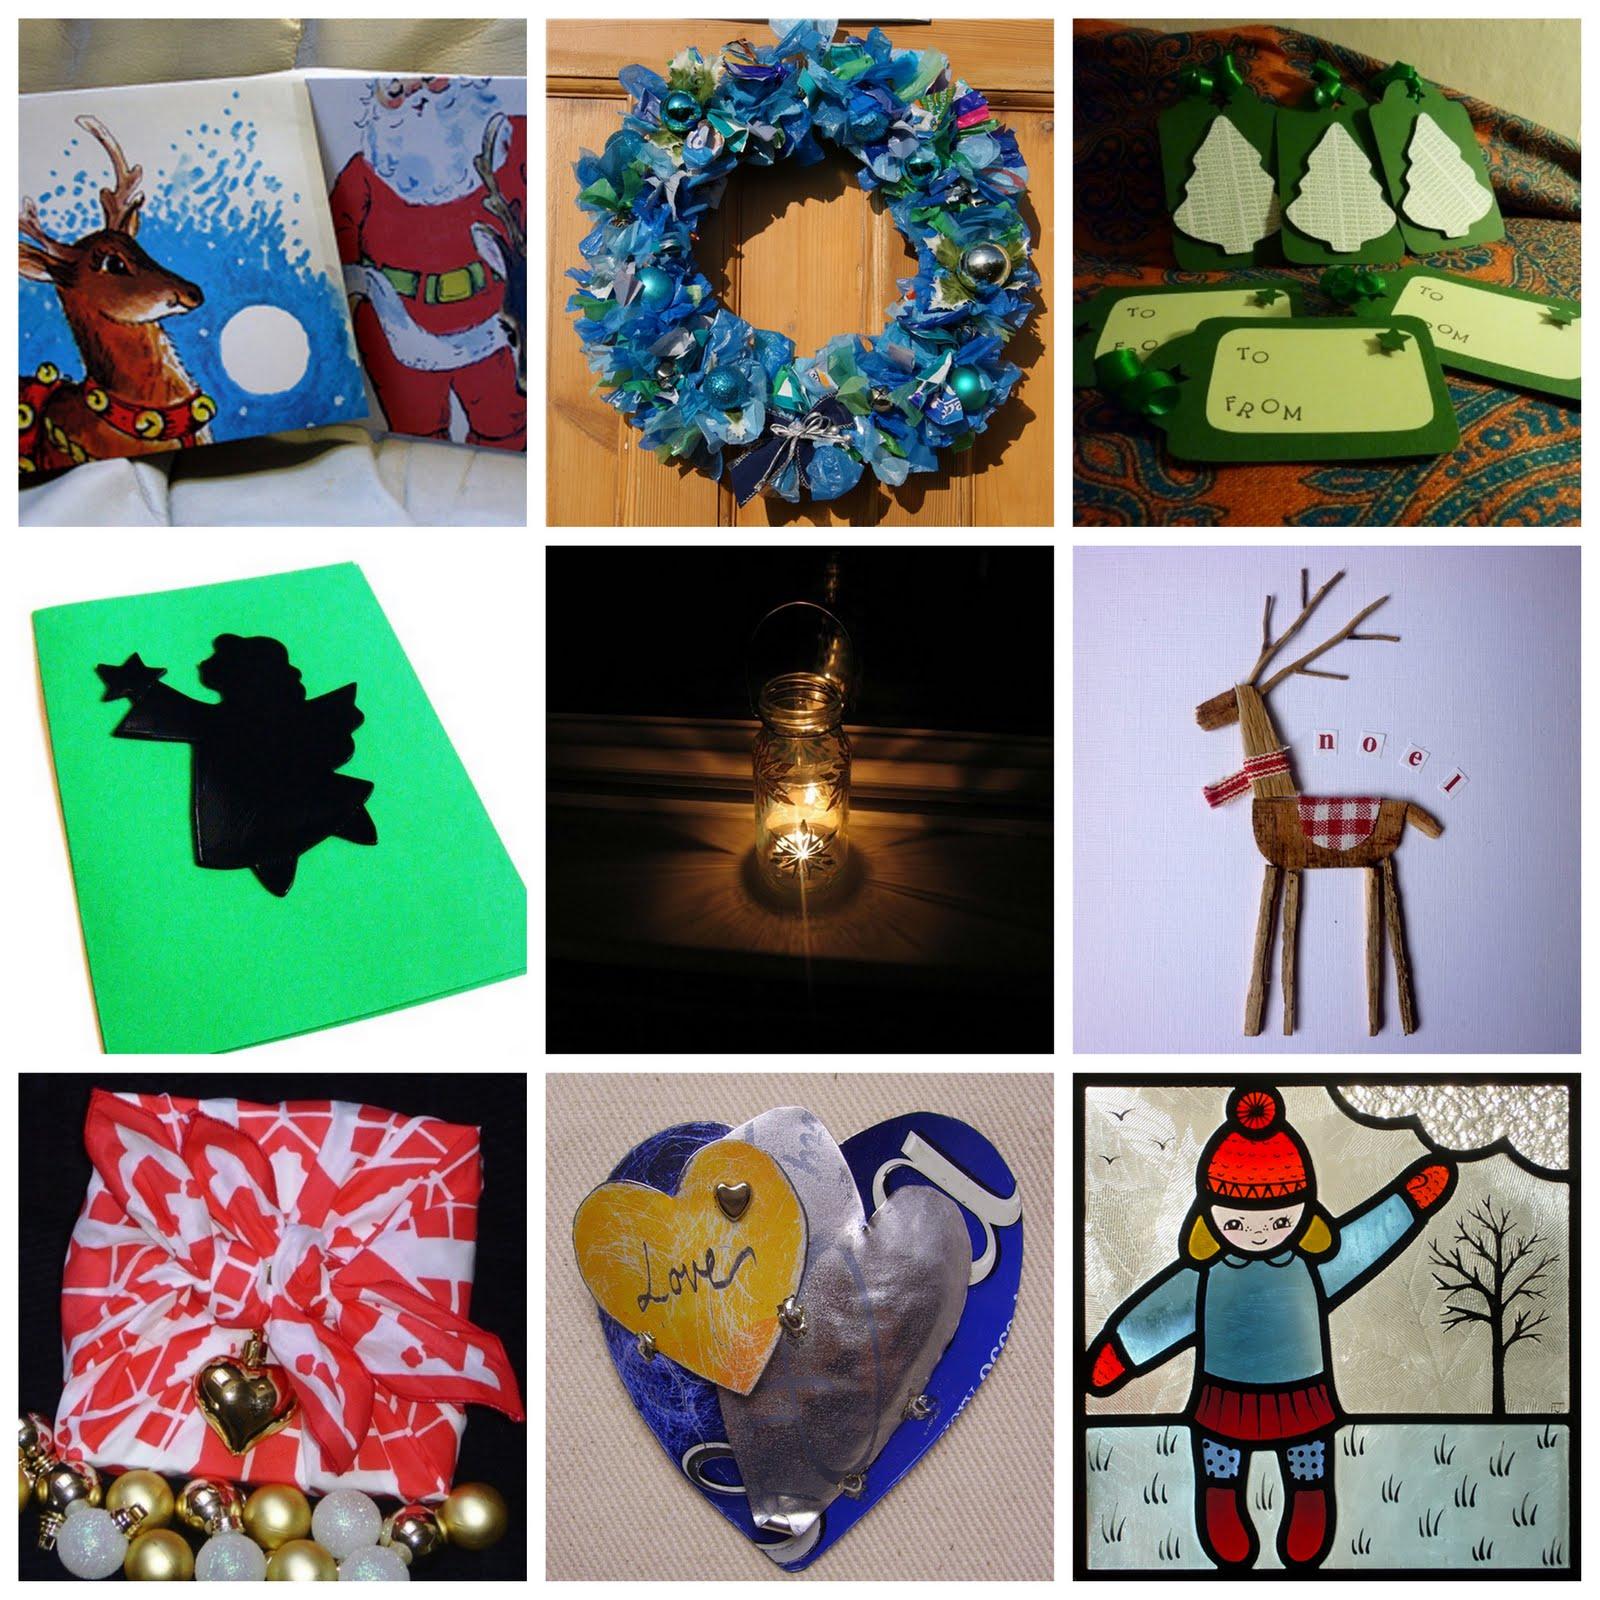 Handmade christmas robin decoration claire hurd design - 4 Vinyl Record Angel Christmas Card Sisily Love 5 Snowflake Lantern Blossom Fair 6 Driftwood Reindeer Christmas Card Kirsty Elson Designs